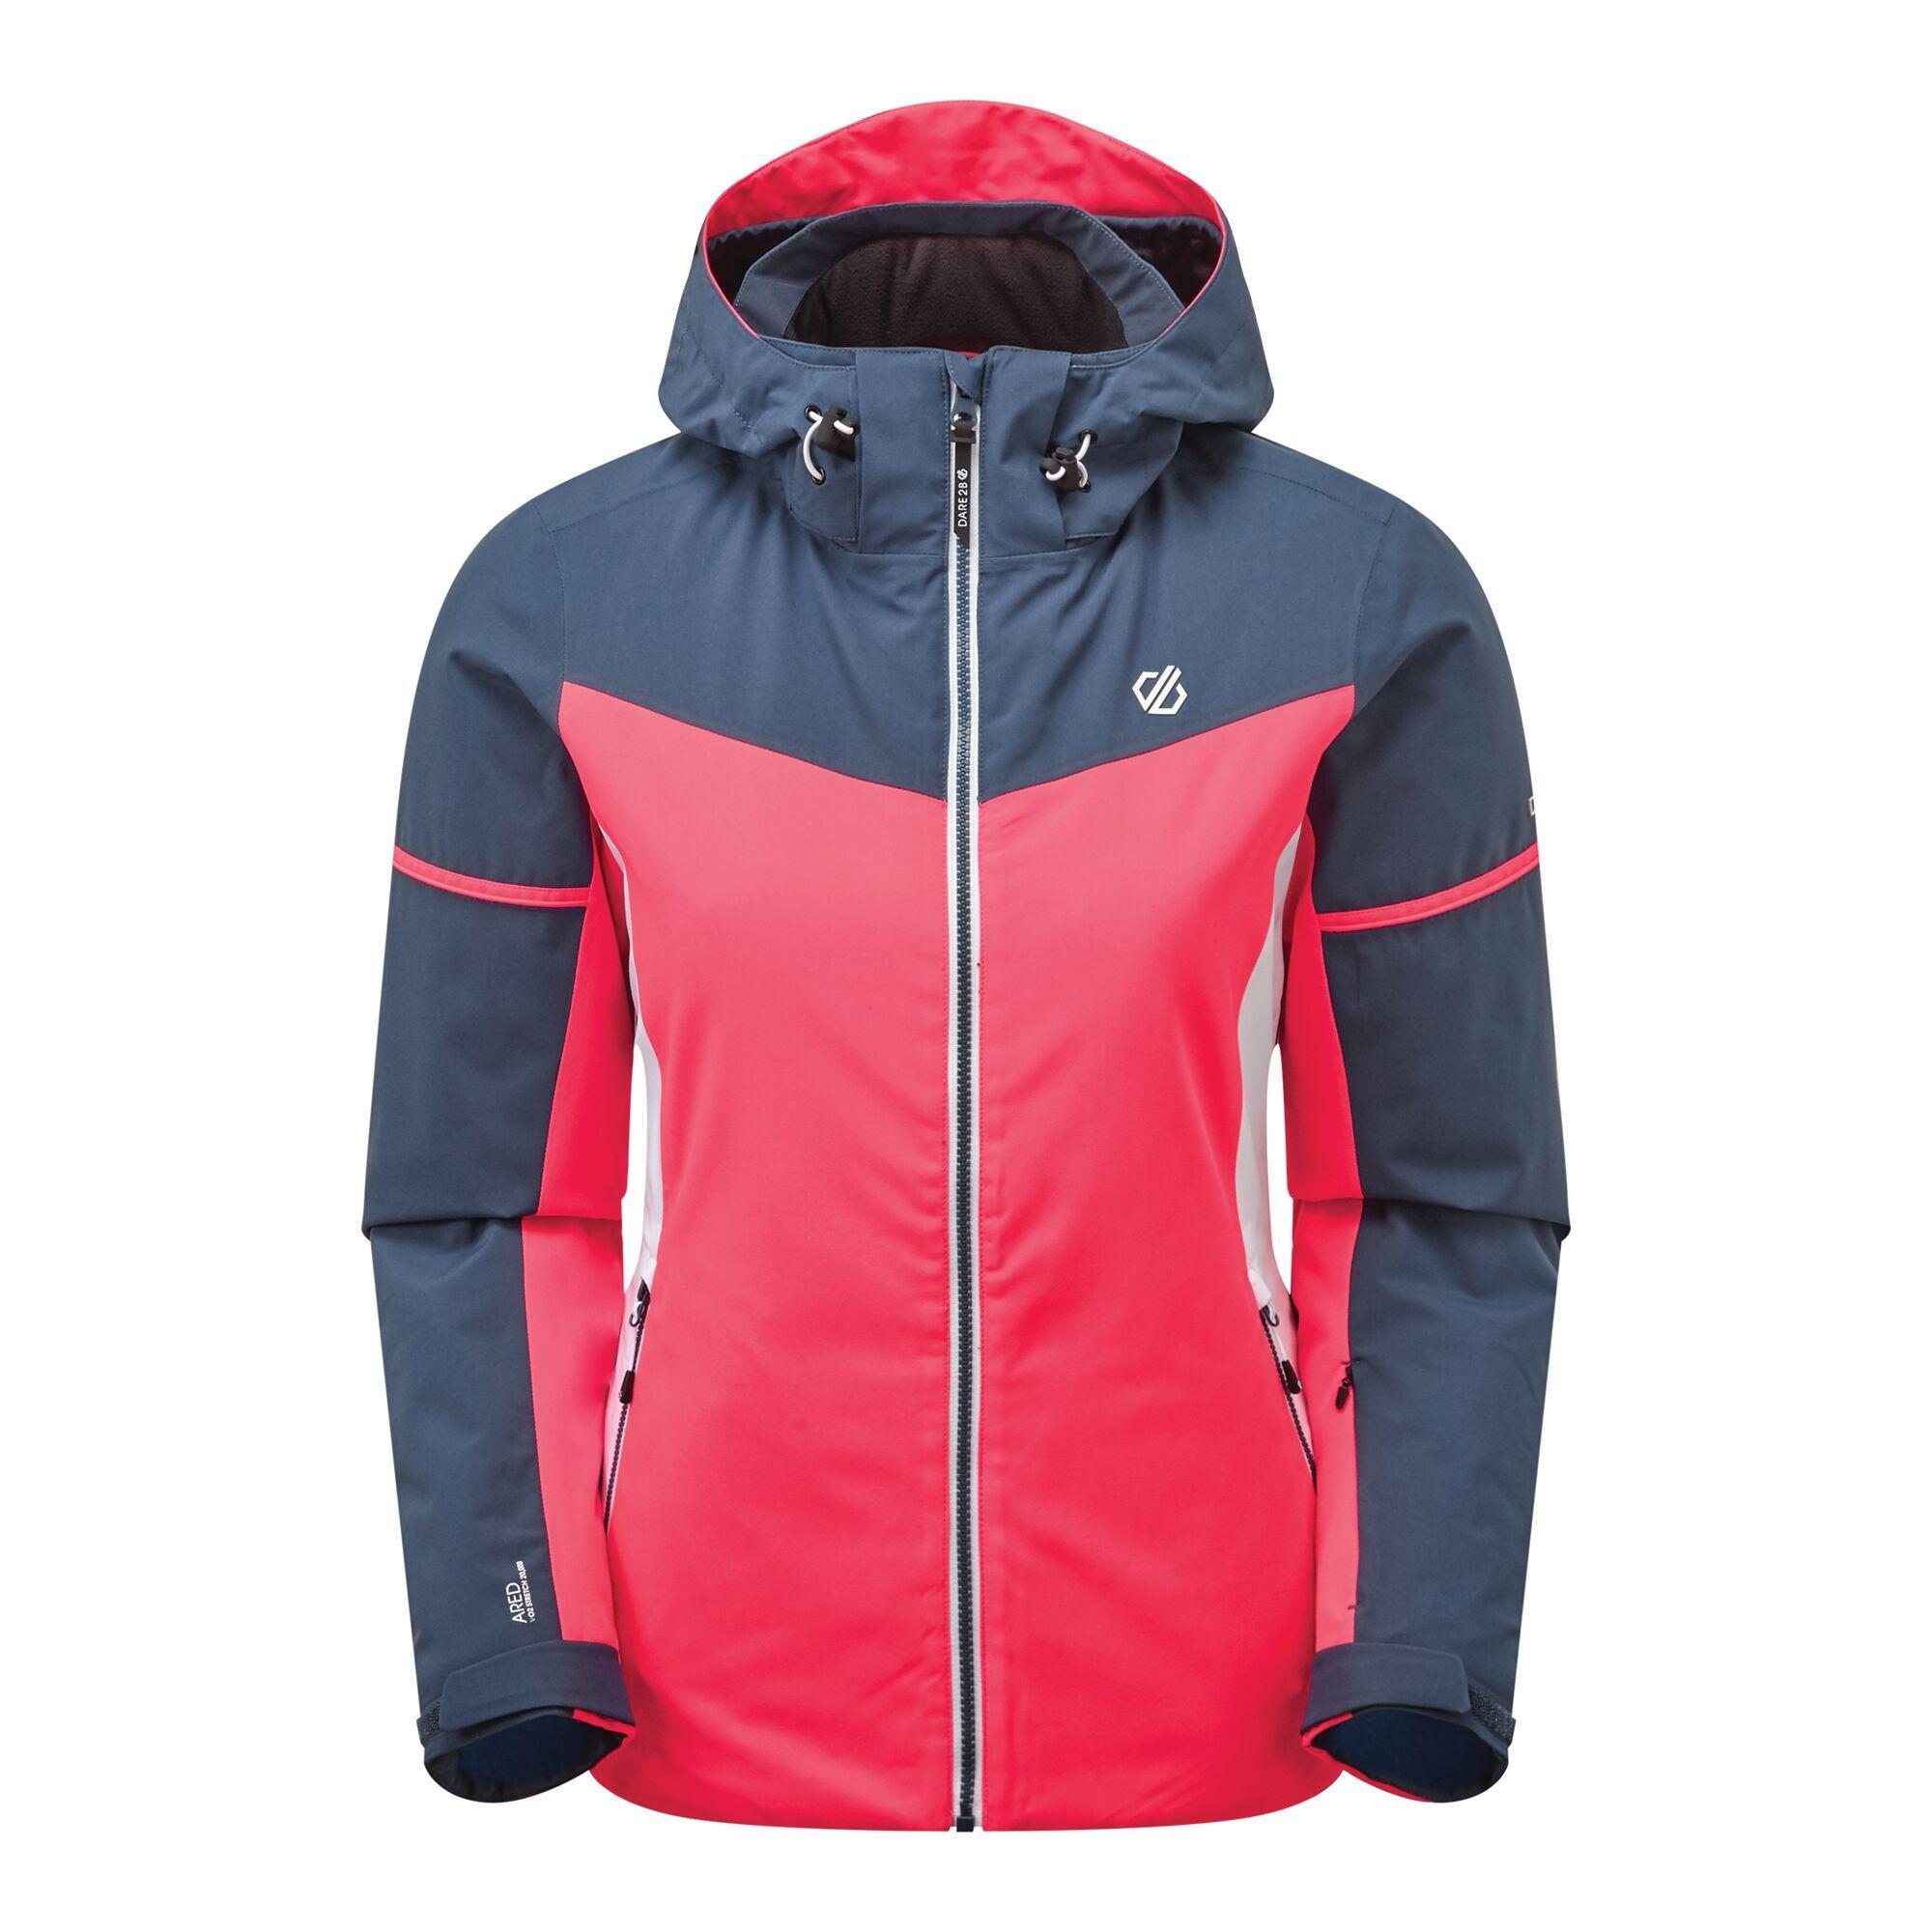 Dare 2B Womens/Ladies Enclave Insulated Ski Jacket (12 UK) (Neon Pink/Dark Denim)